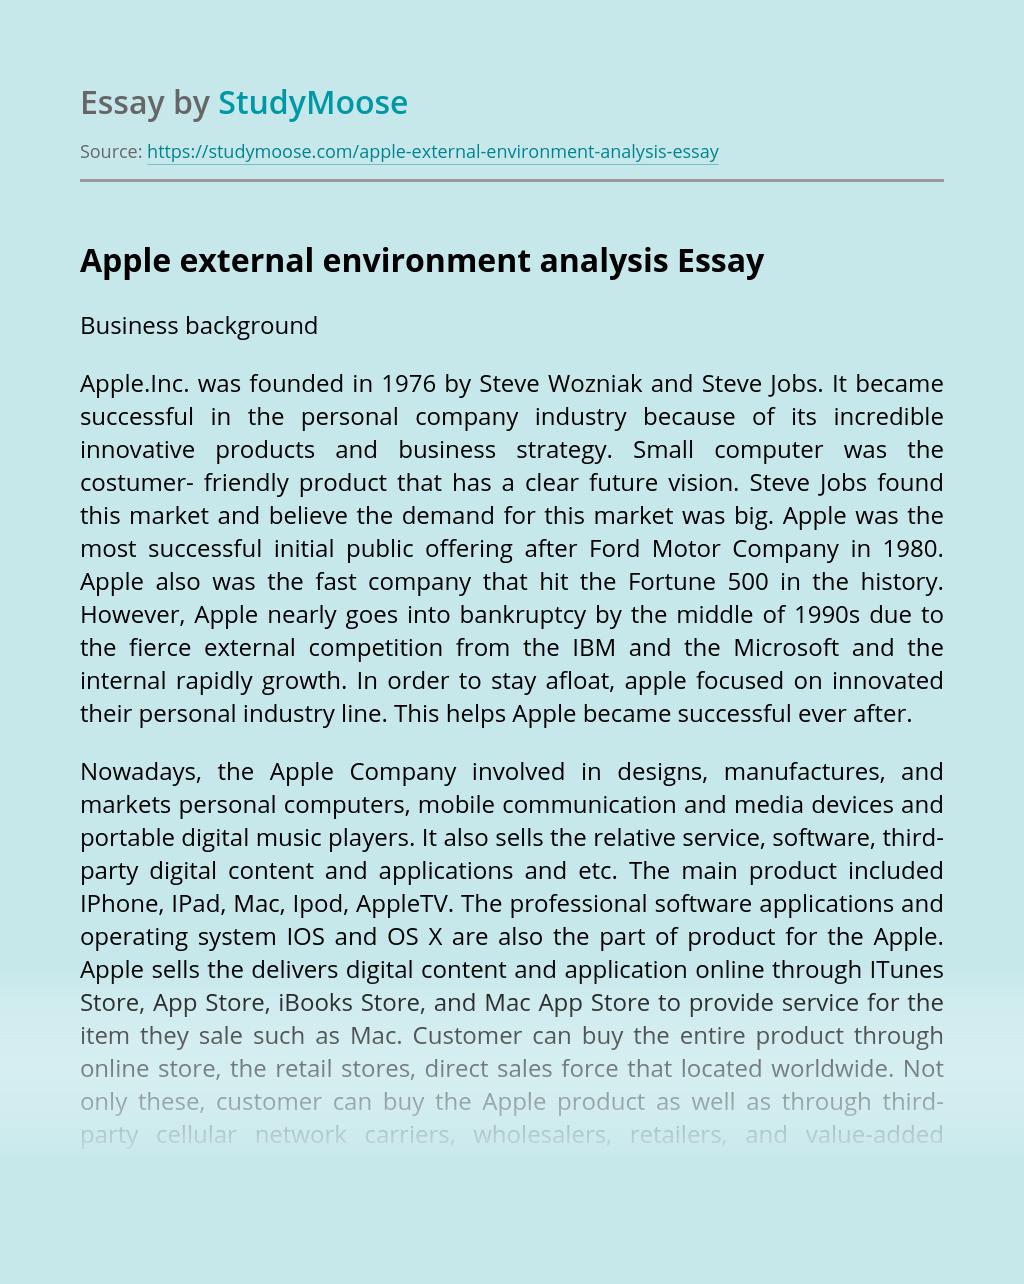 Apple external environment analysis